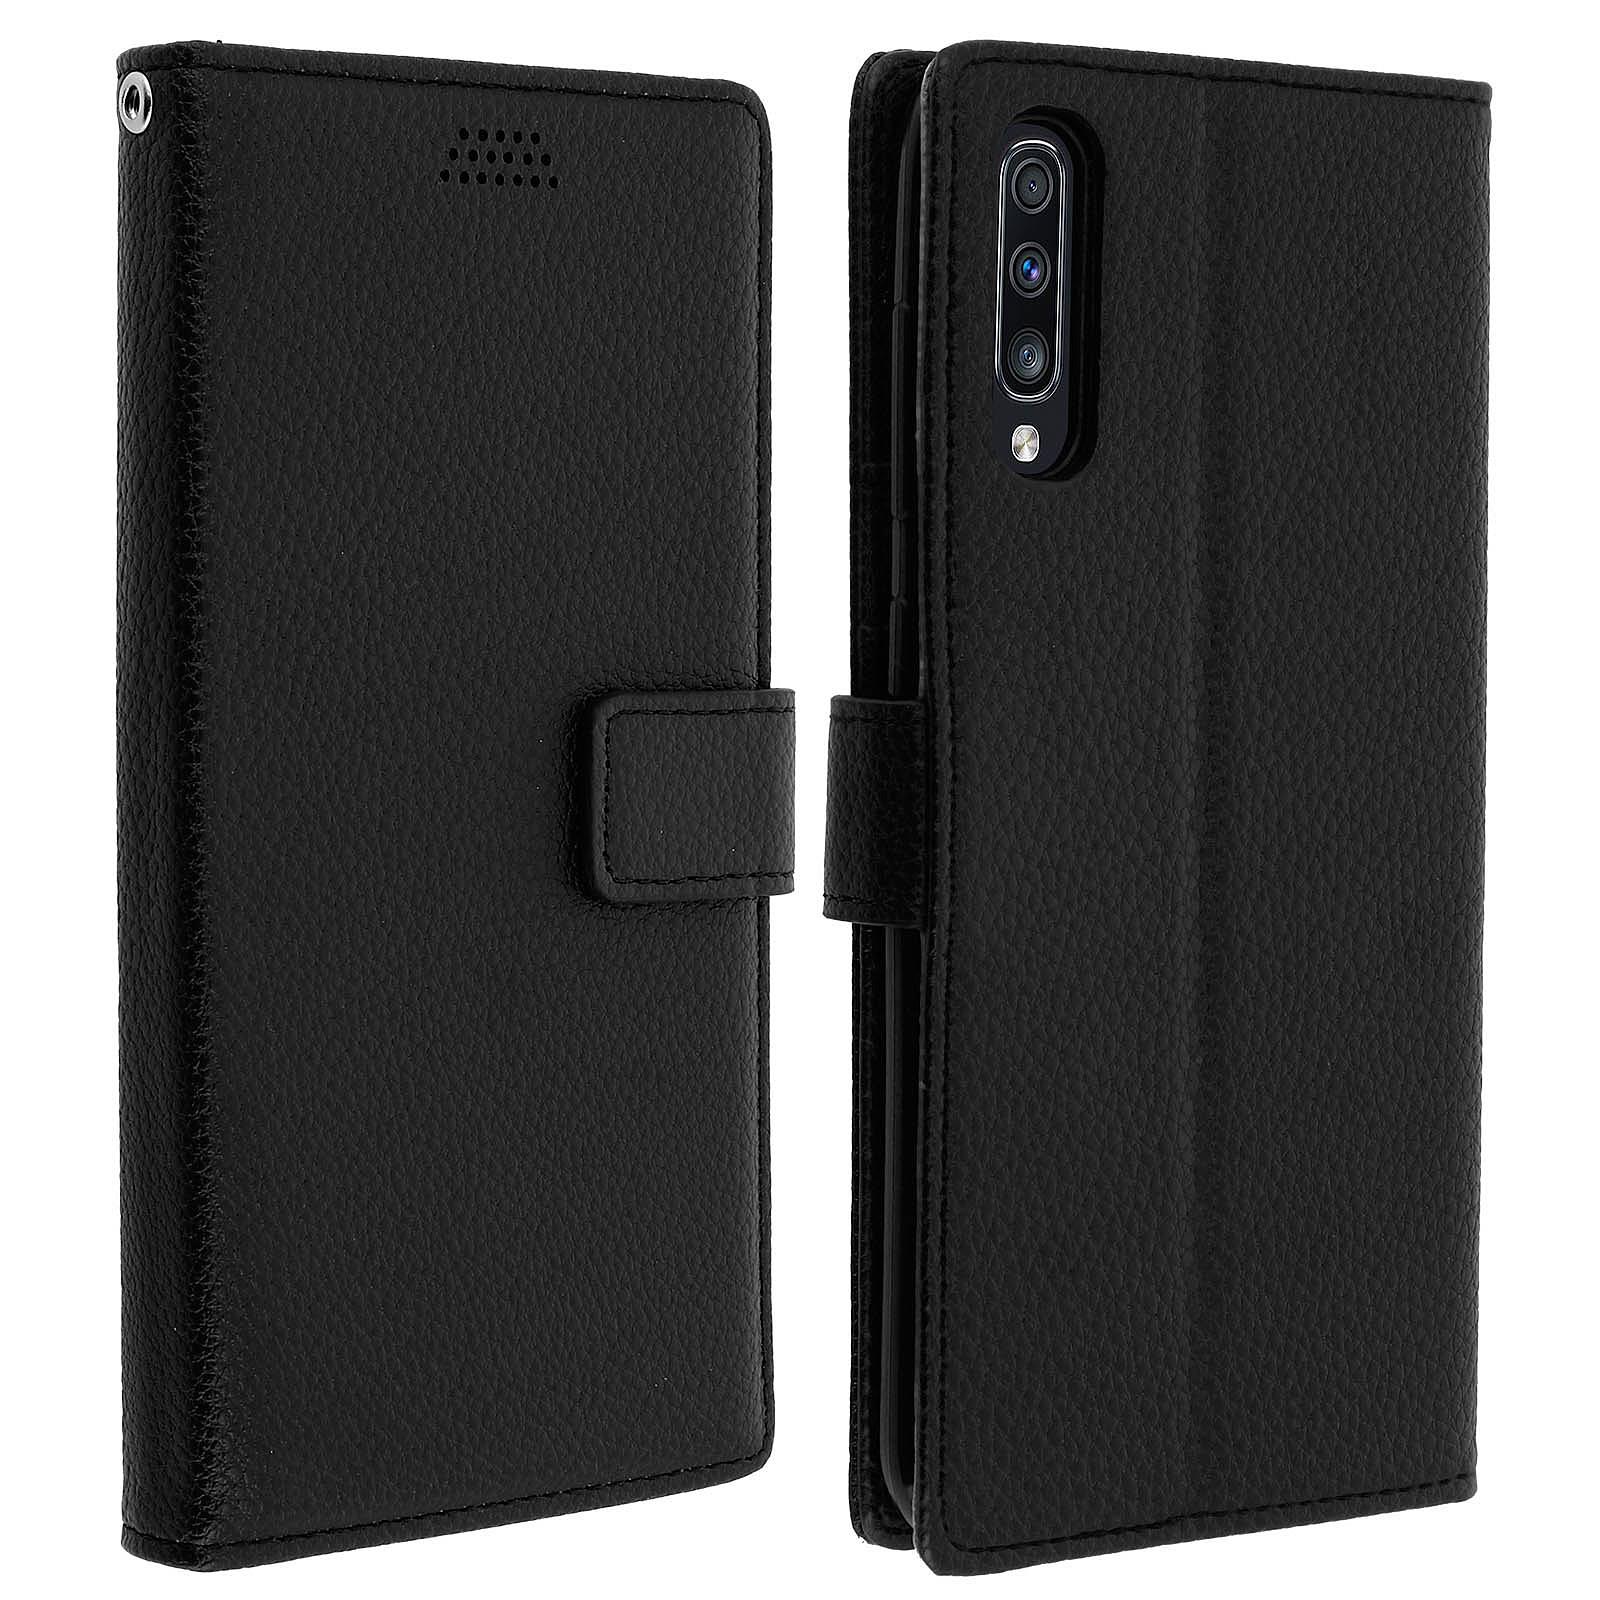 Avizar Etui folio Noir pour Samsung Galaxy A70